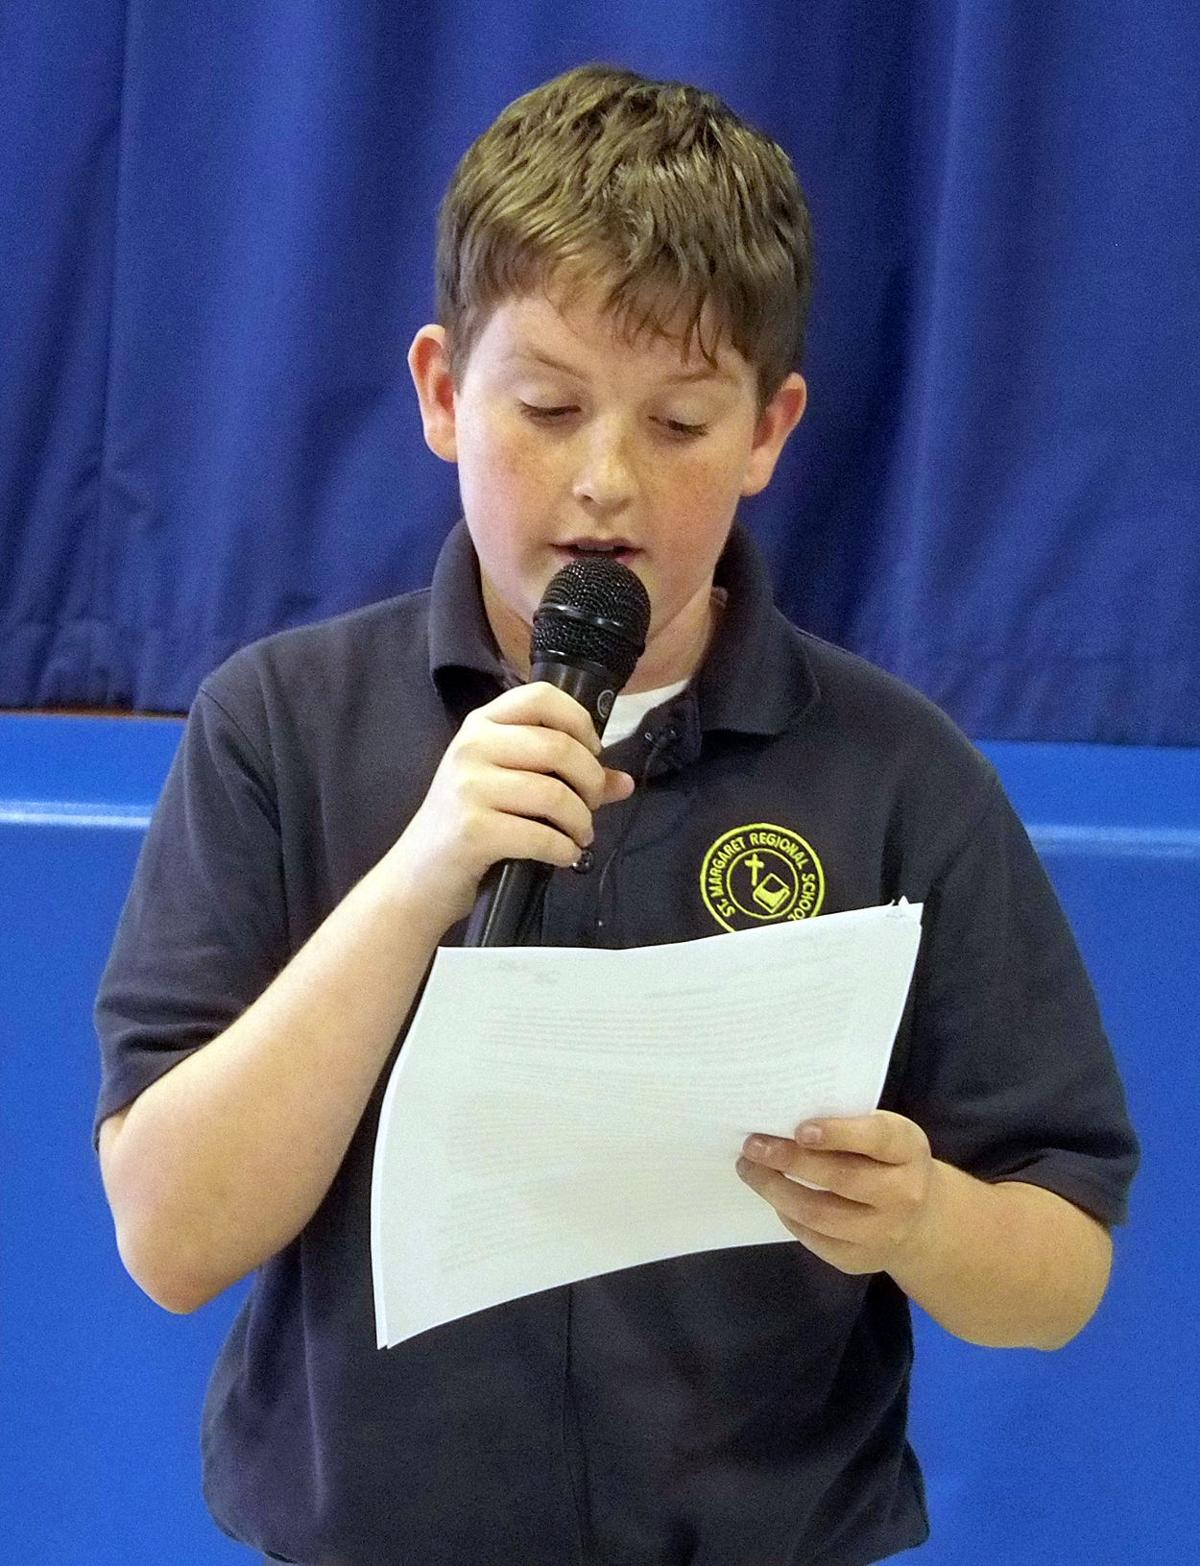 Young essayist